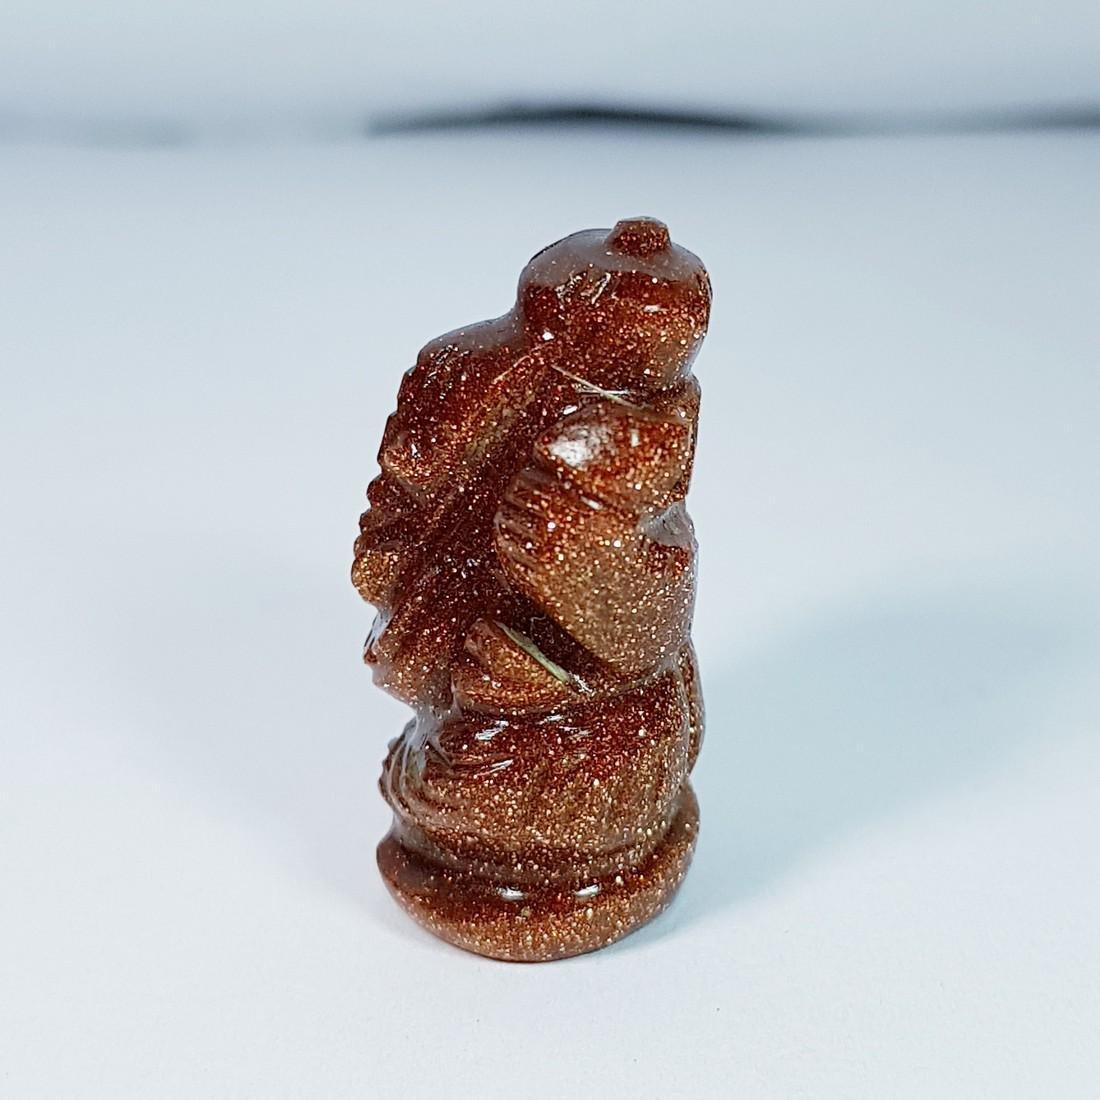 Sun Stone Lord Ganesha Carving - 25.22 ct - 3